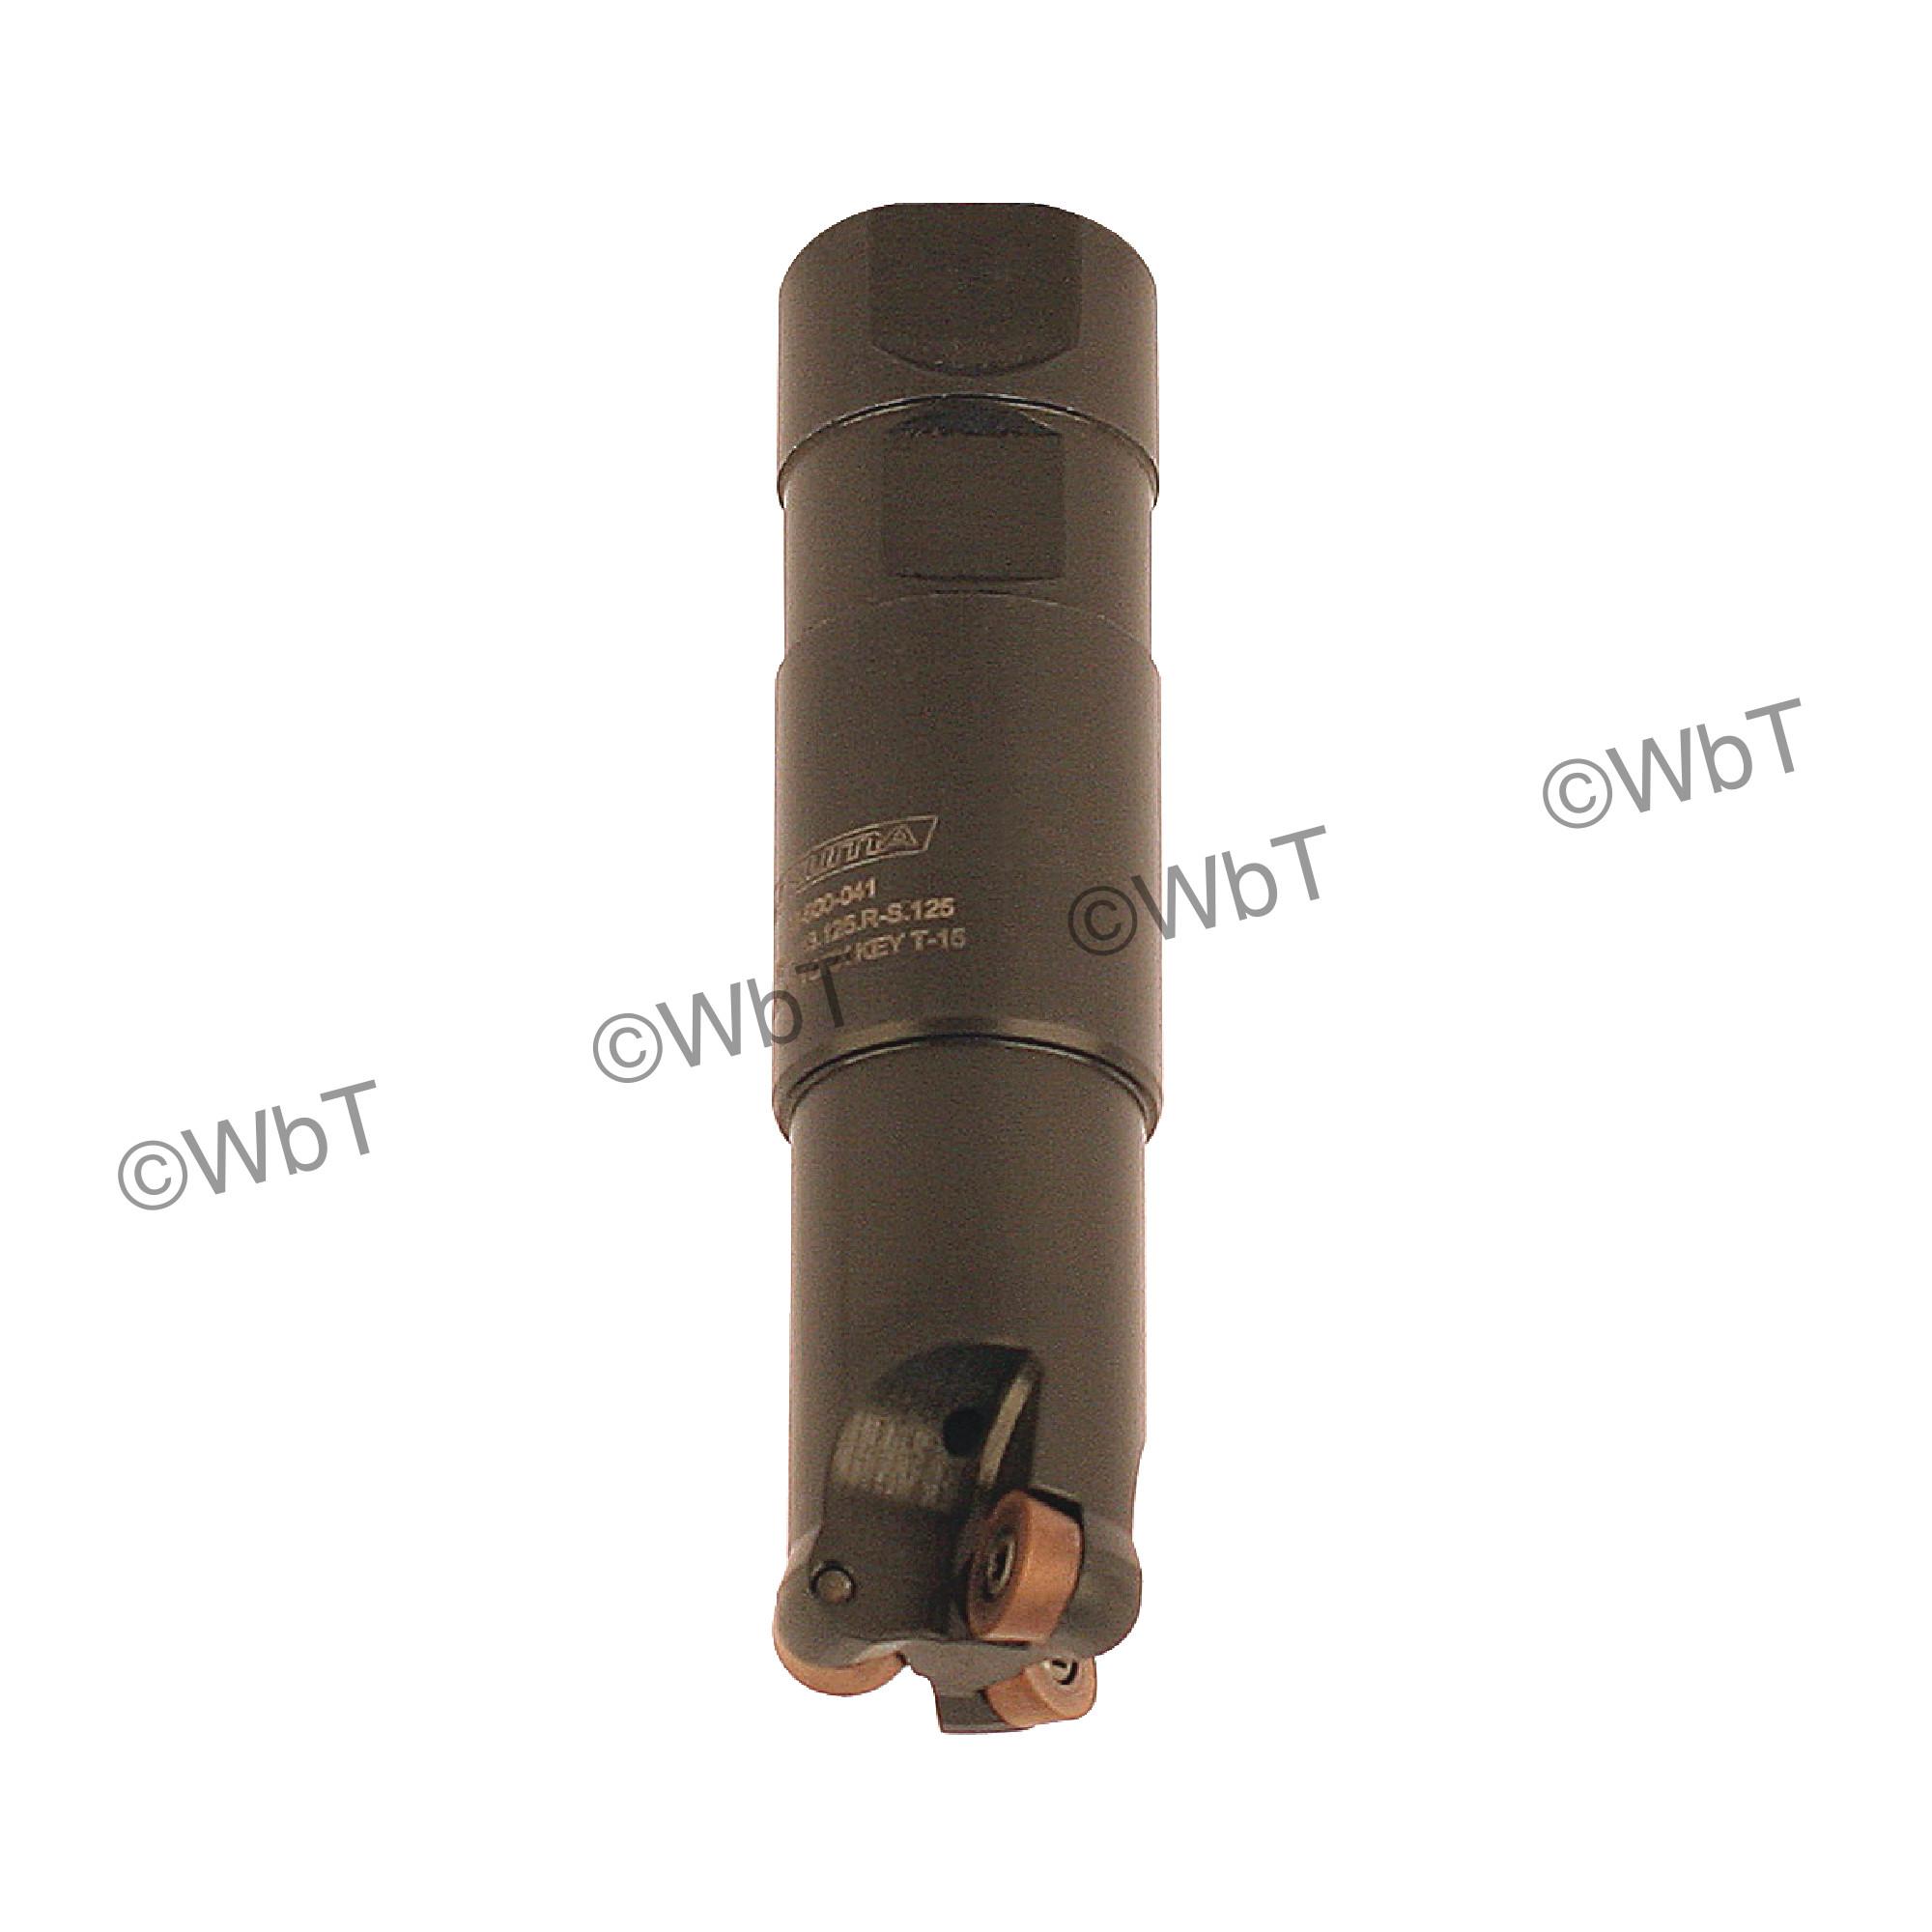 "AKUMA - 1.250"" Endmill Set / Includes: (1) RPS.43.125.R-S.125 (1.25""ø) & (10) RPMT1204M0S-M1 PM15M Coated Inserts"